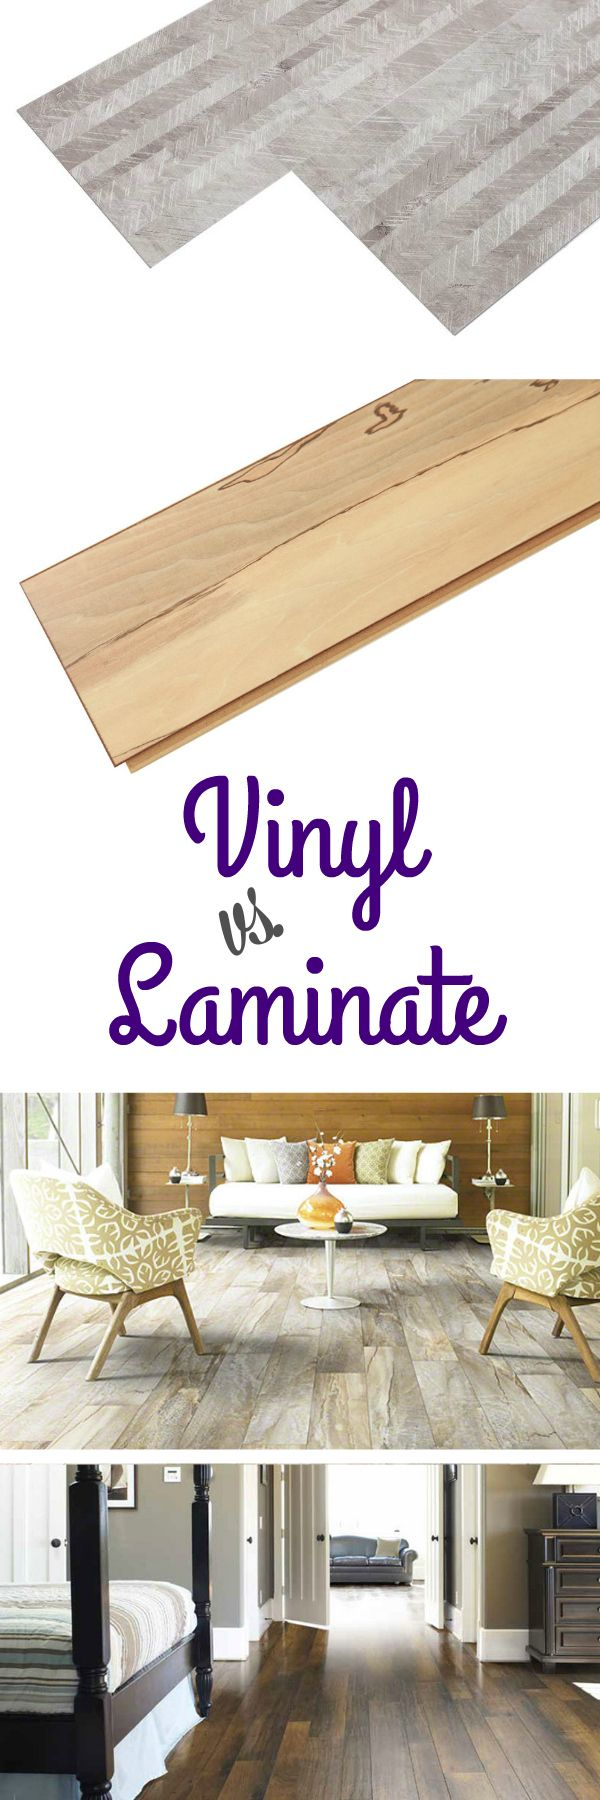 Best 25+ Cost of wood flooring ideas on Pinterest | Cheap wood ...